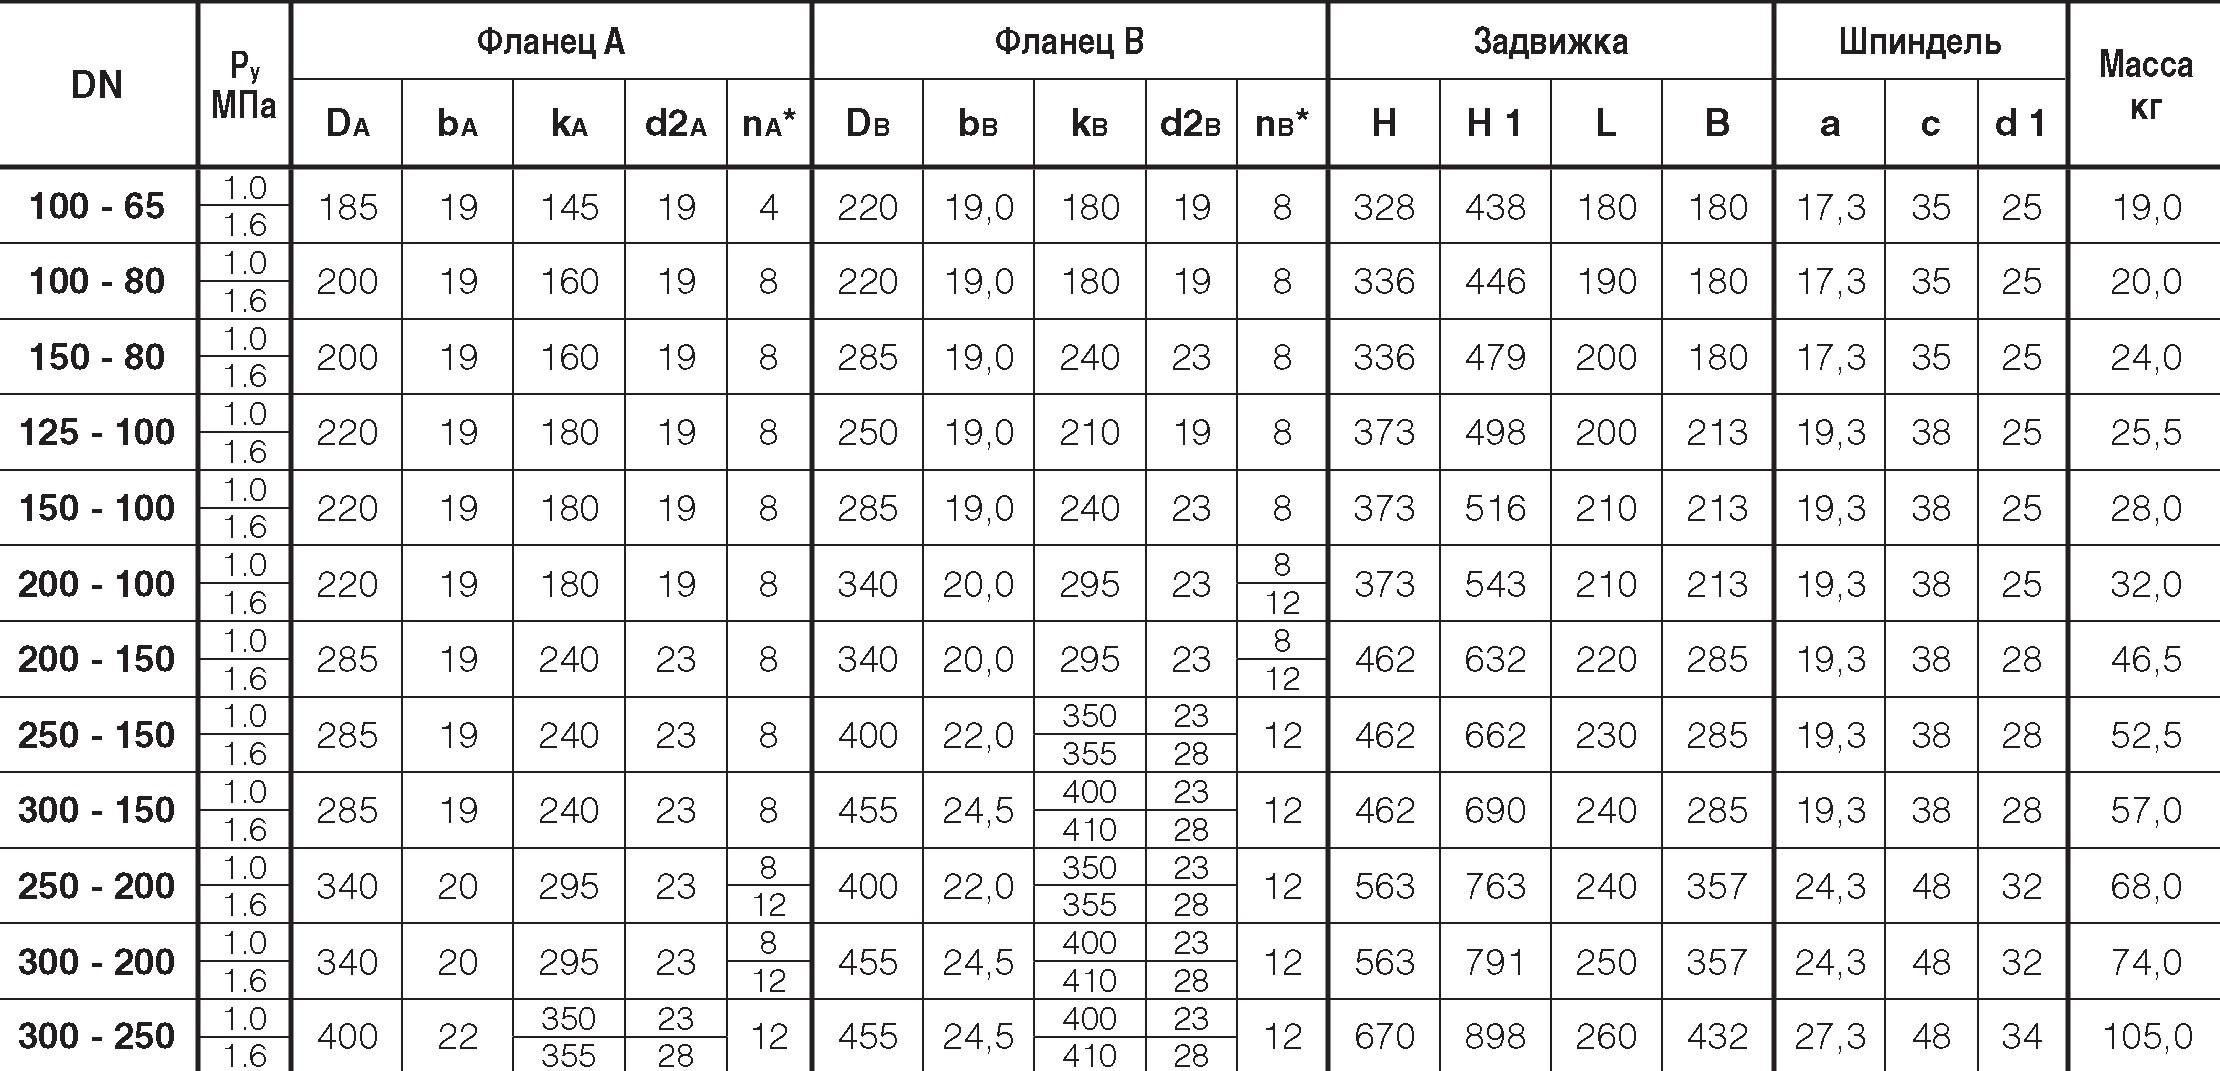 Таблица характеристик для Задвижка клиновая чугунная фланцевая Hawle 4150E2 (переходная)